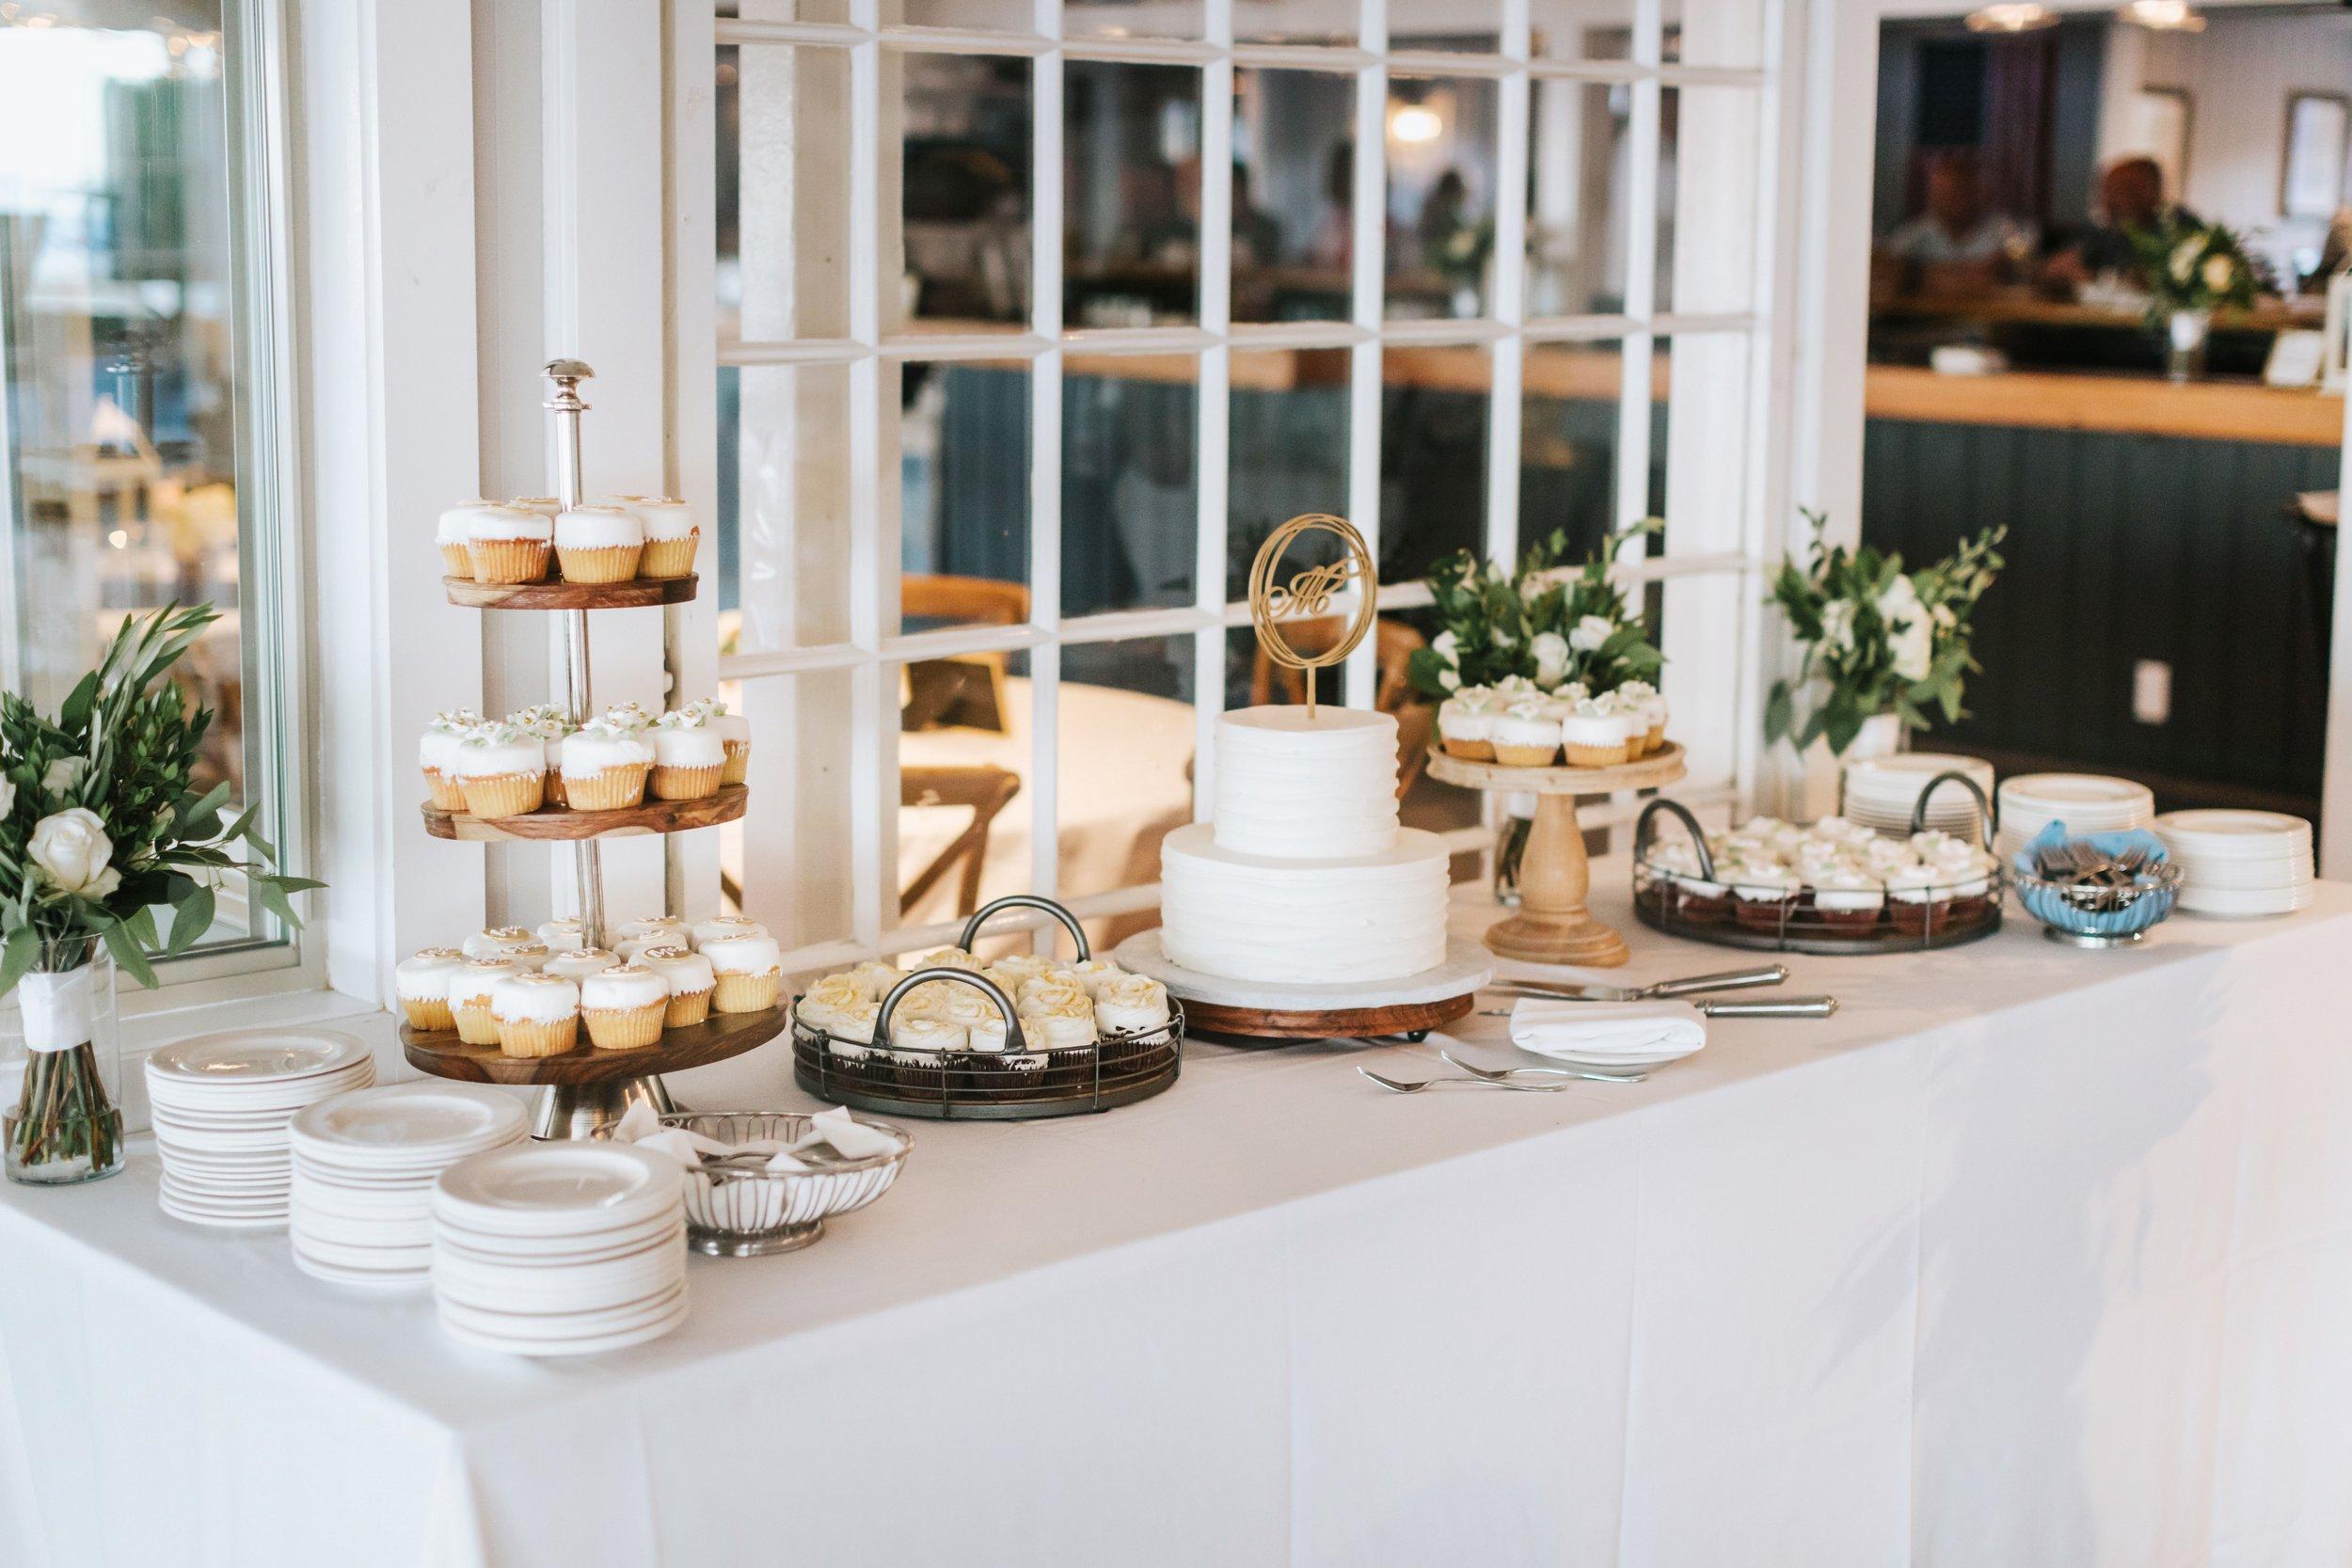 Popponesset-Inn-Wedding-Cape-Cod-Lena-Mirisola-Photography-46.jpg